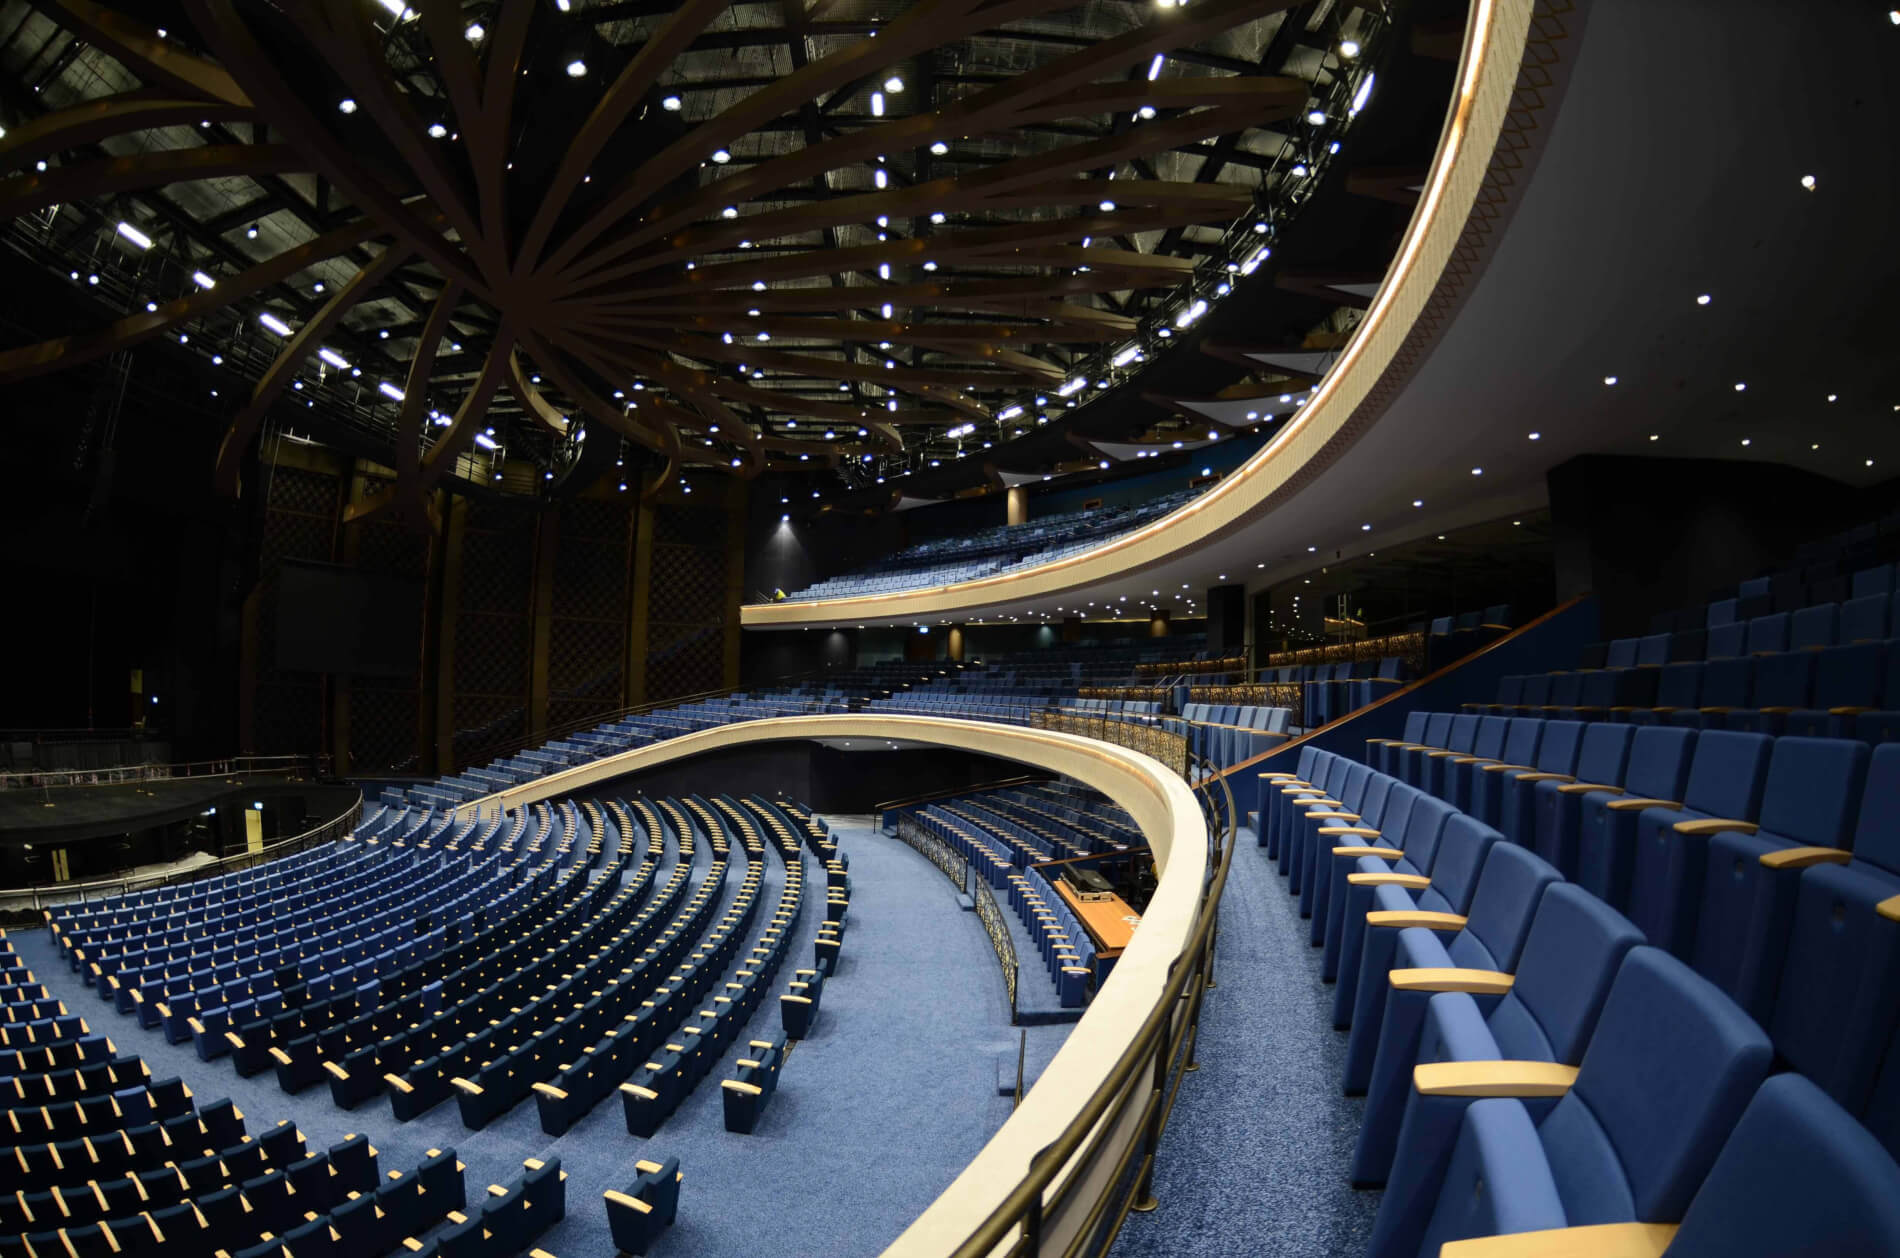 Oman Convention & Exhibition Centre (OCEC) 0